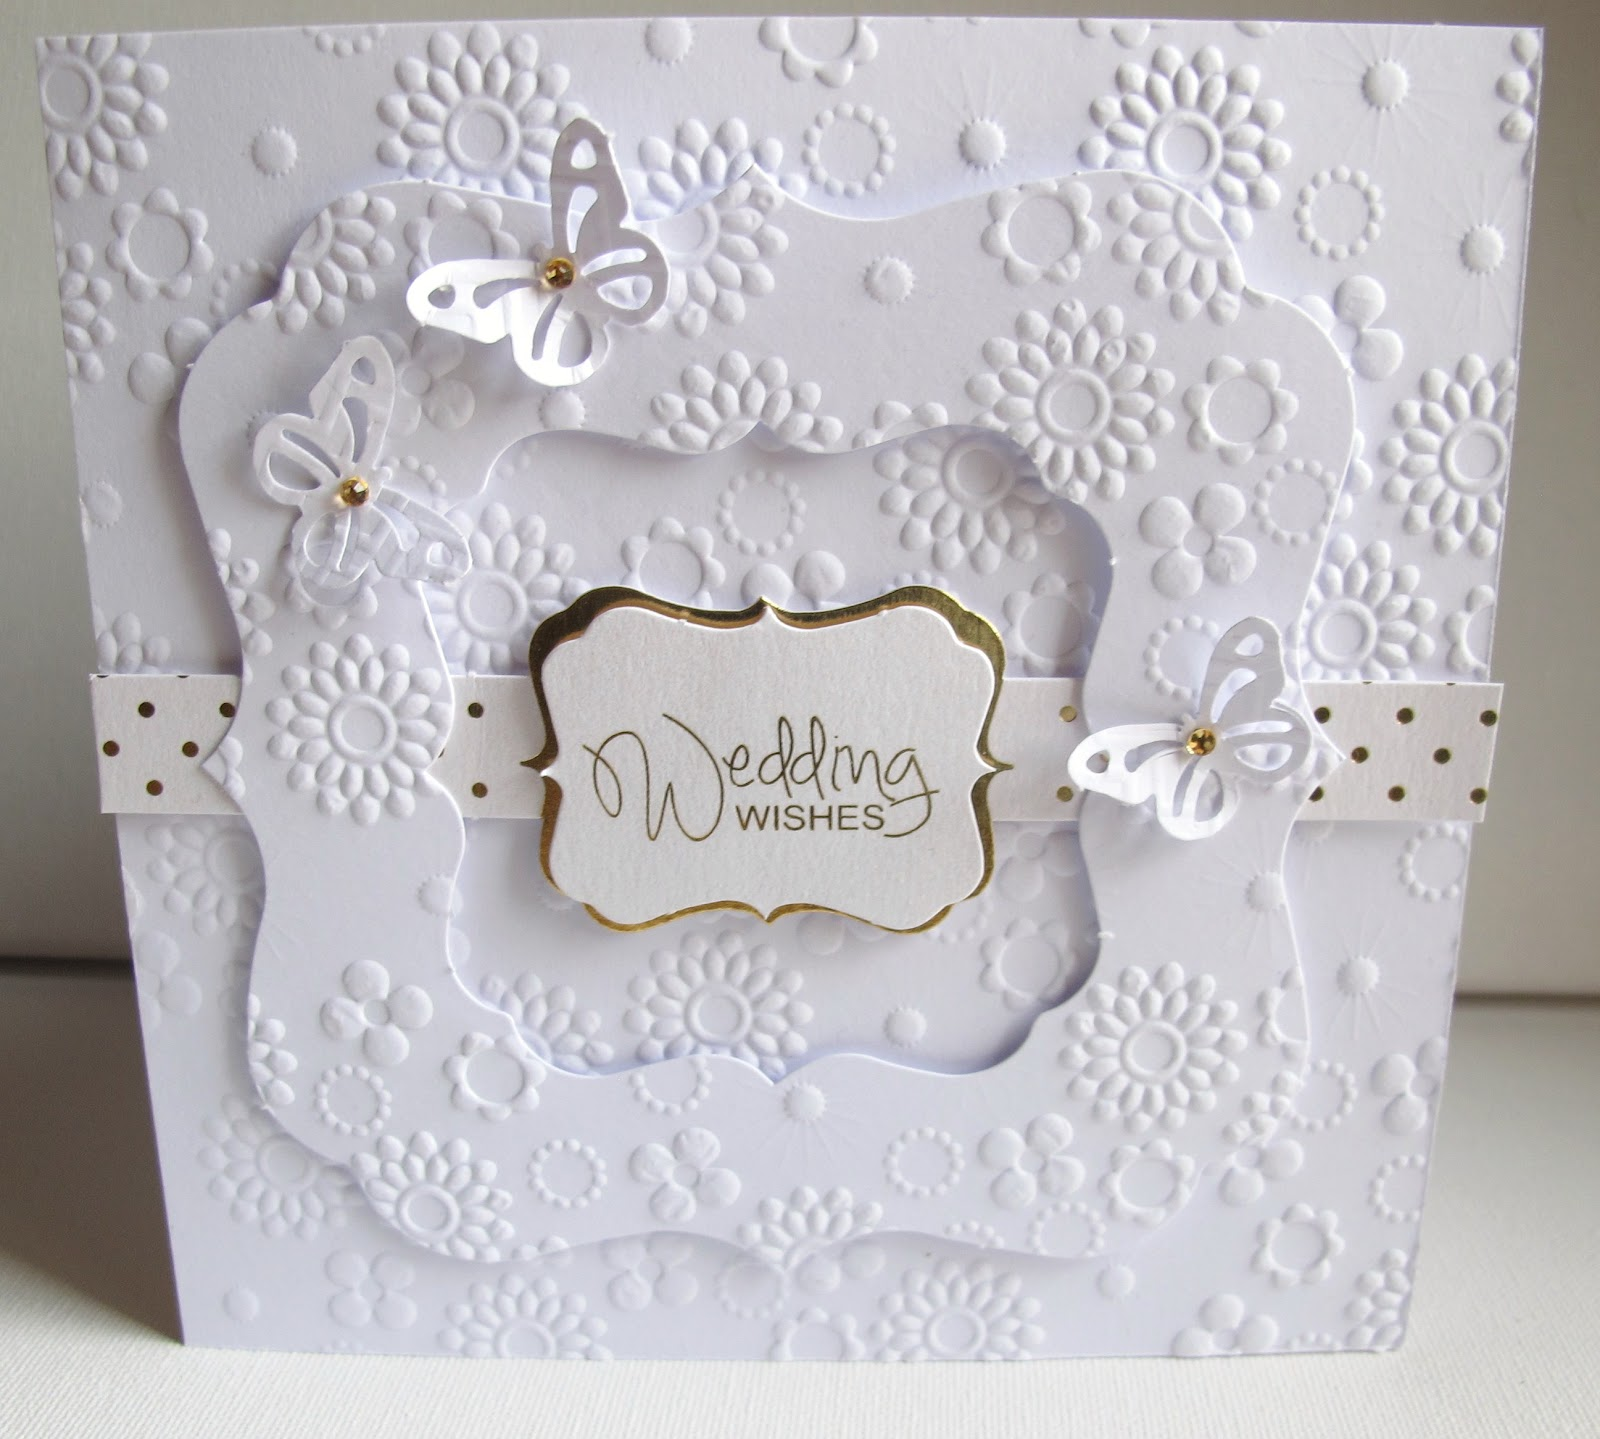 Going Buggy: Embossed Wedding Card